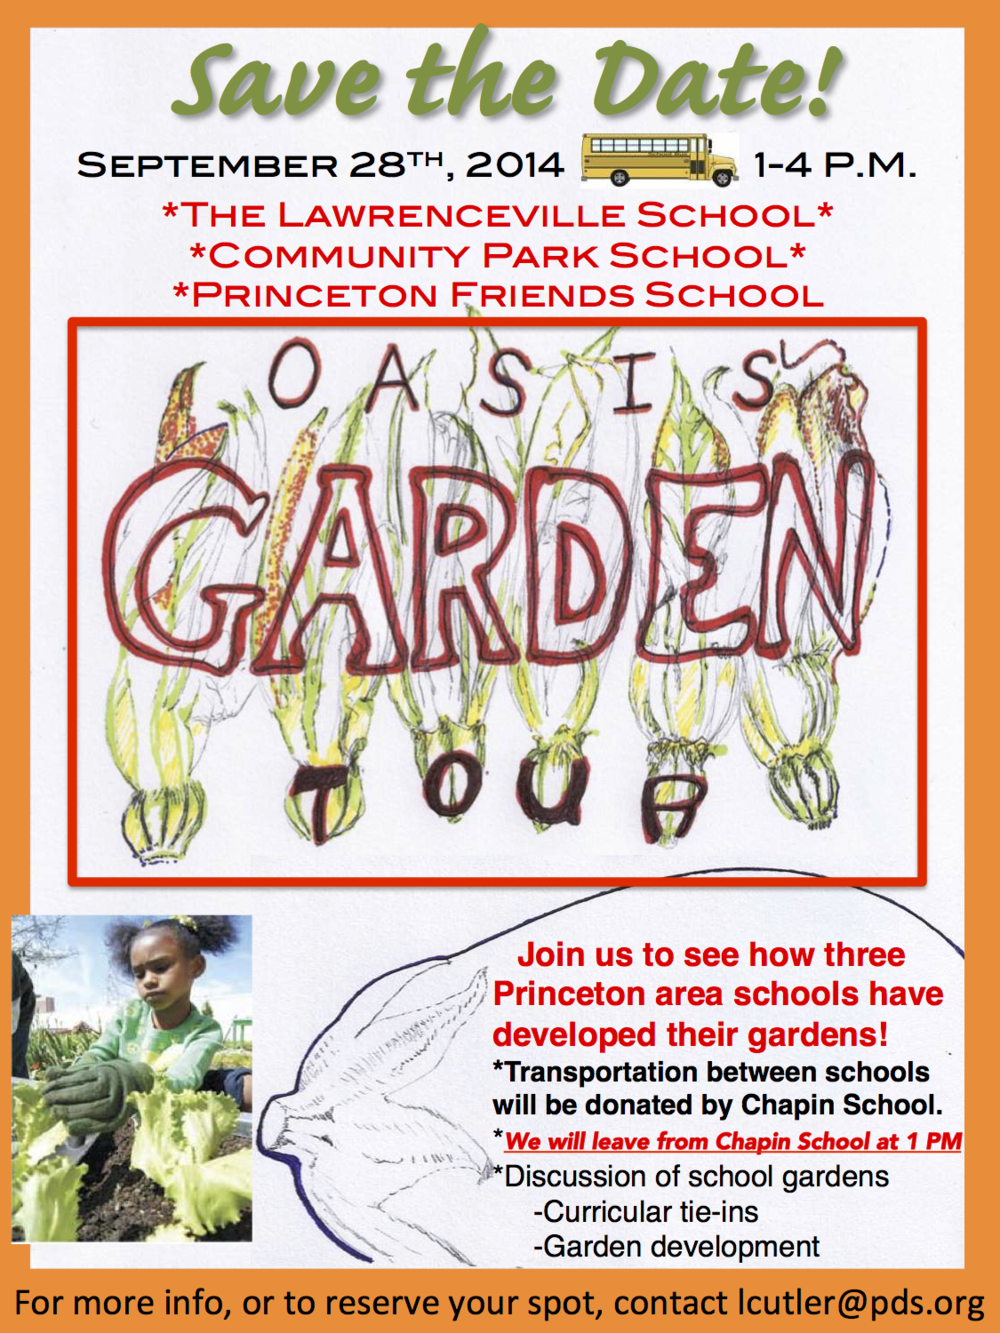 OASIS SCHOOL GARDEN TOUR 2014-2